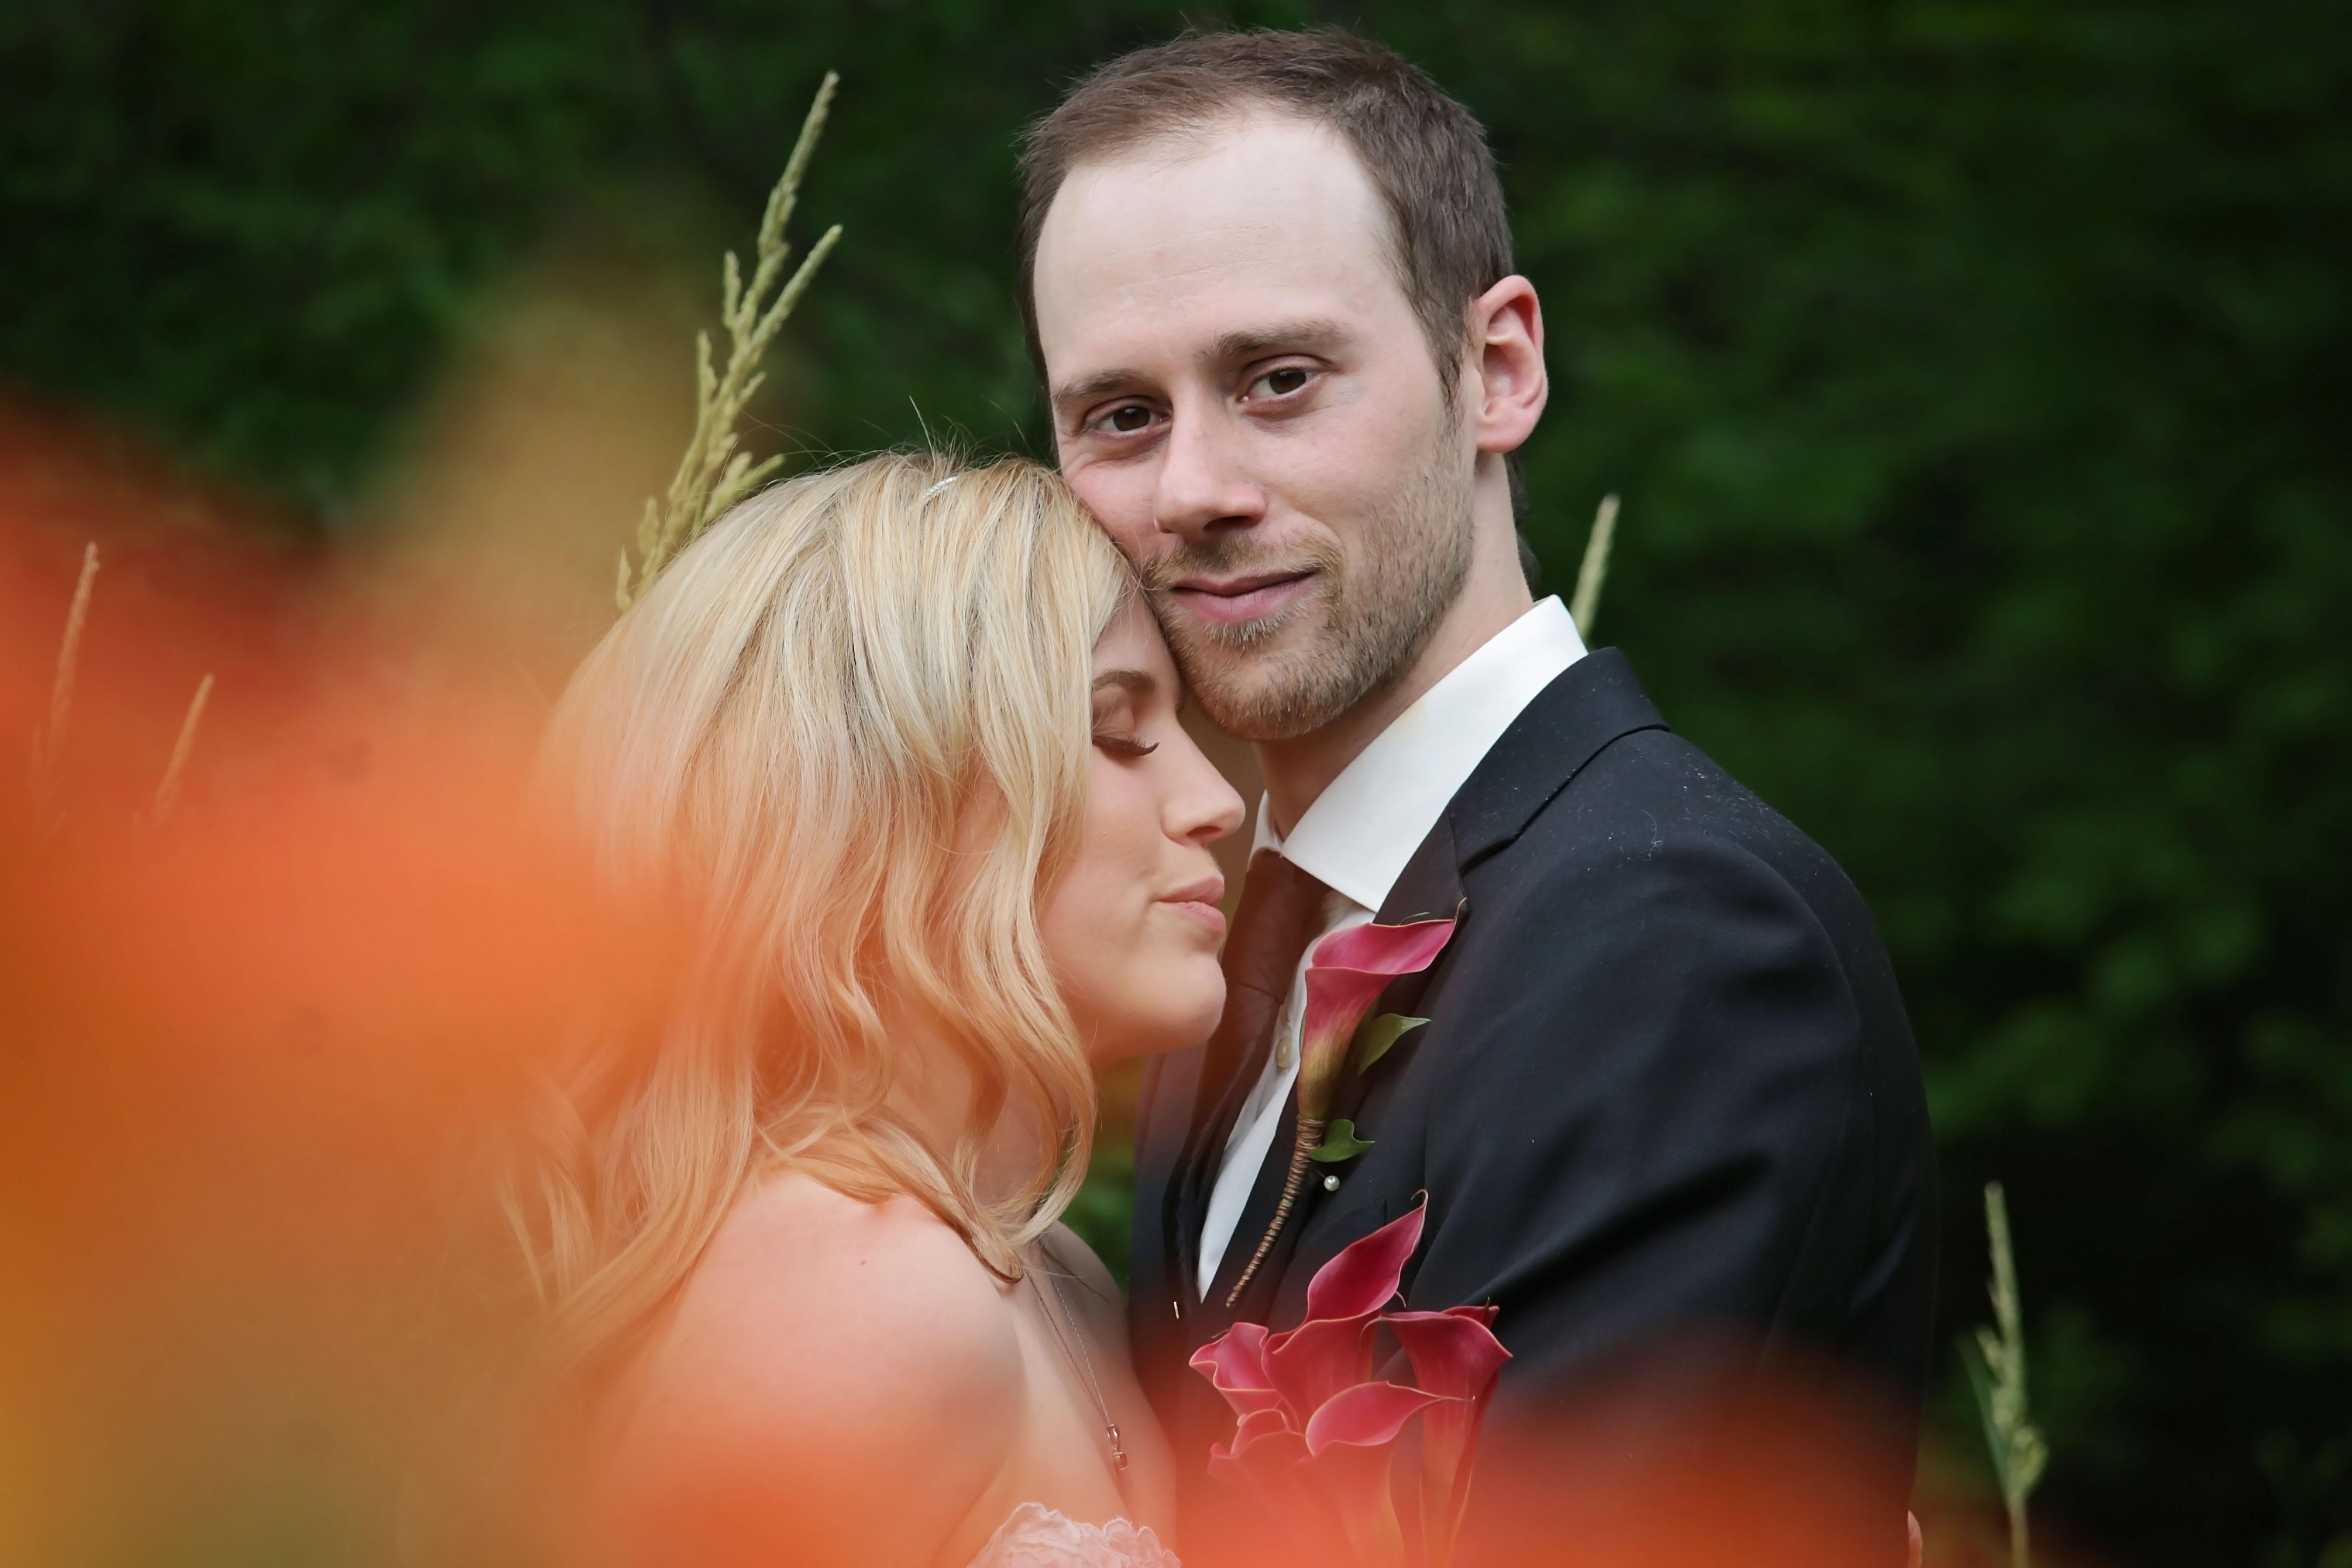 Wedding Photographers in Niagara Fal